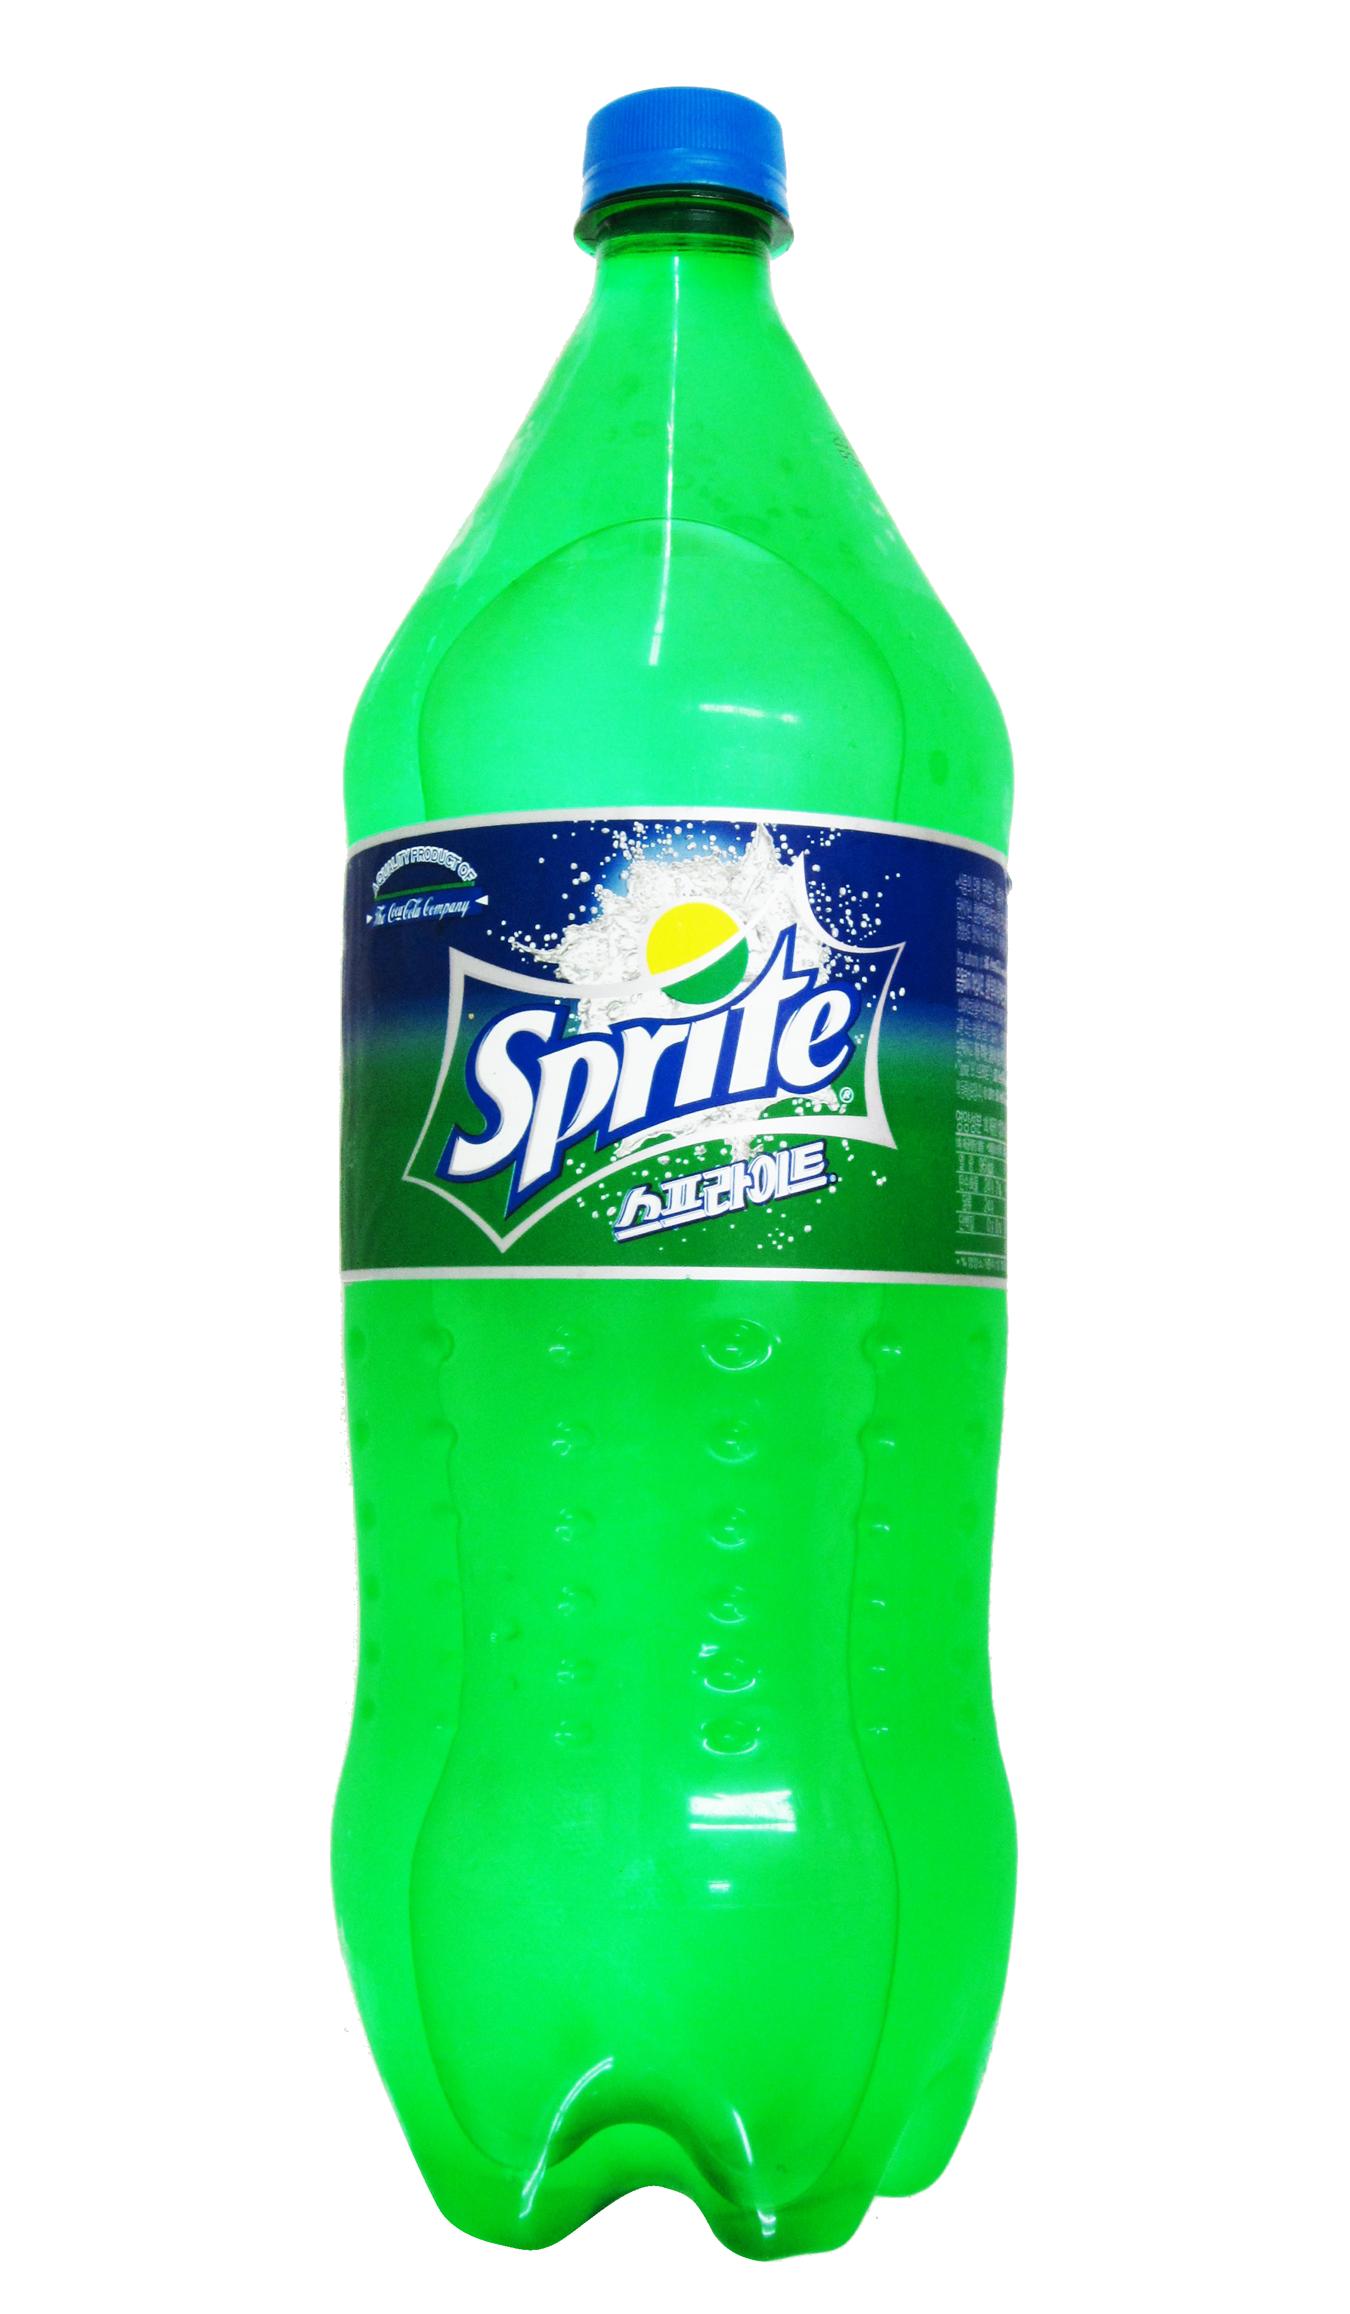 Soda bottle png. Sprite image purepng free